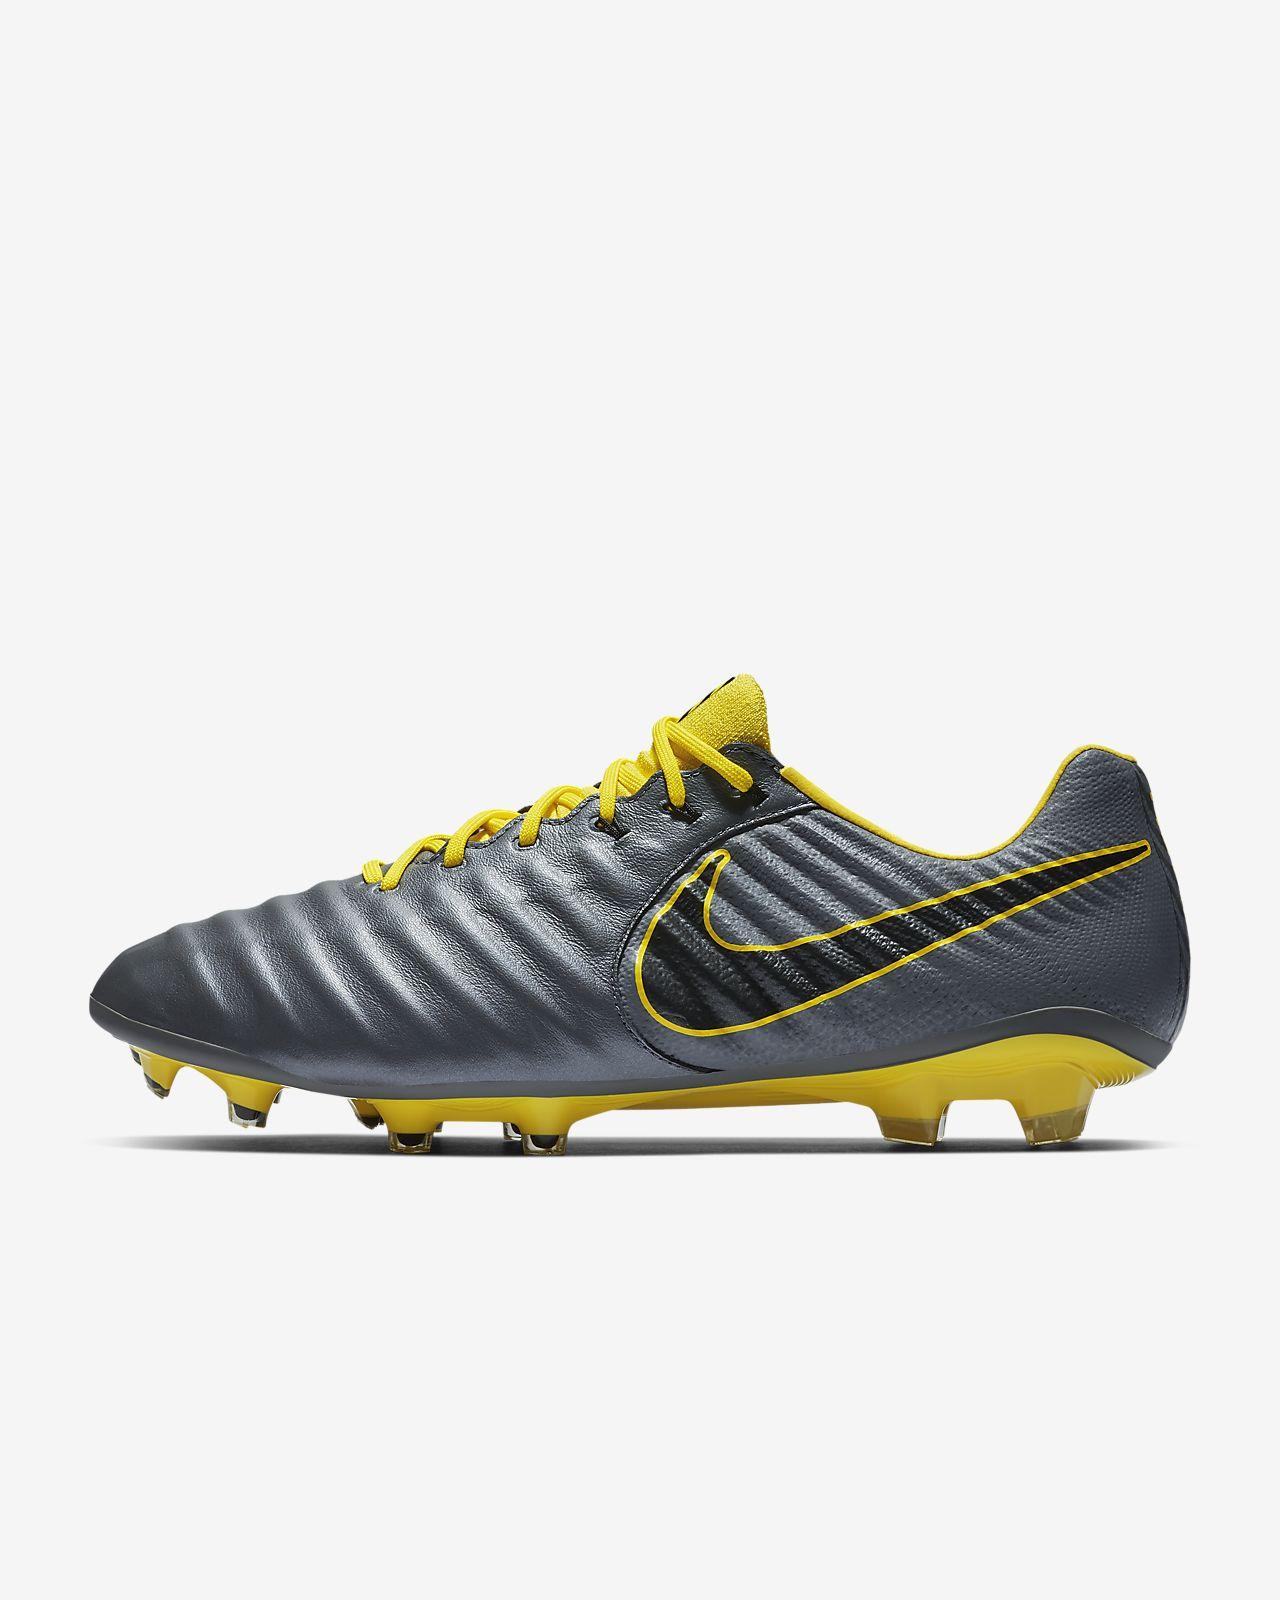 Chuteiras de futebol para terreno firme Nike Legend 7 Elite FG Game Over 88f3d53dba967